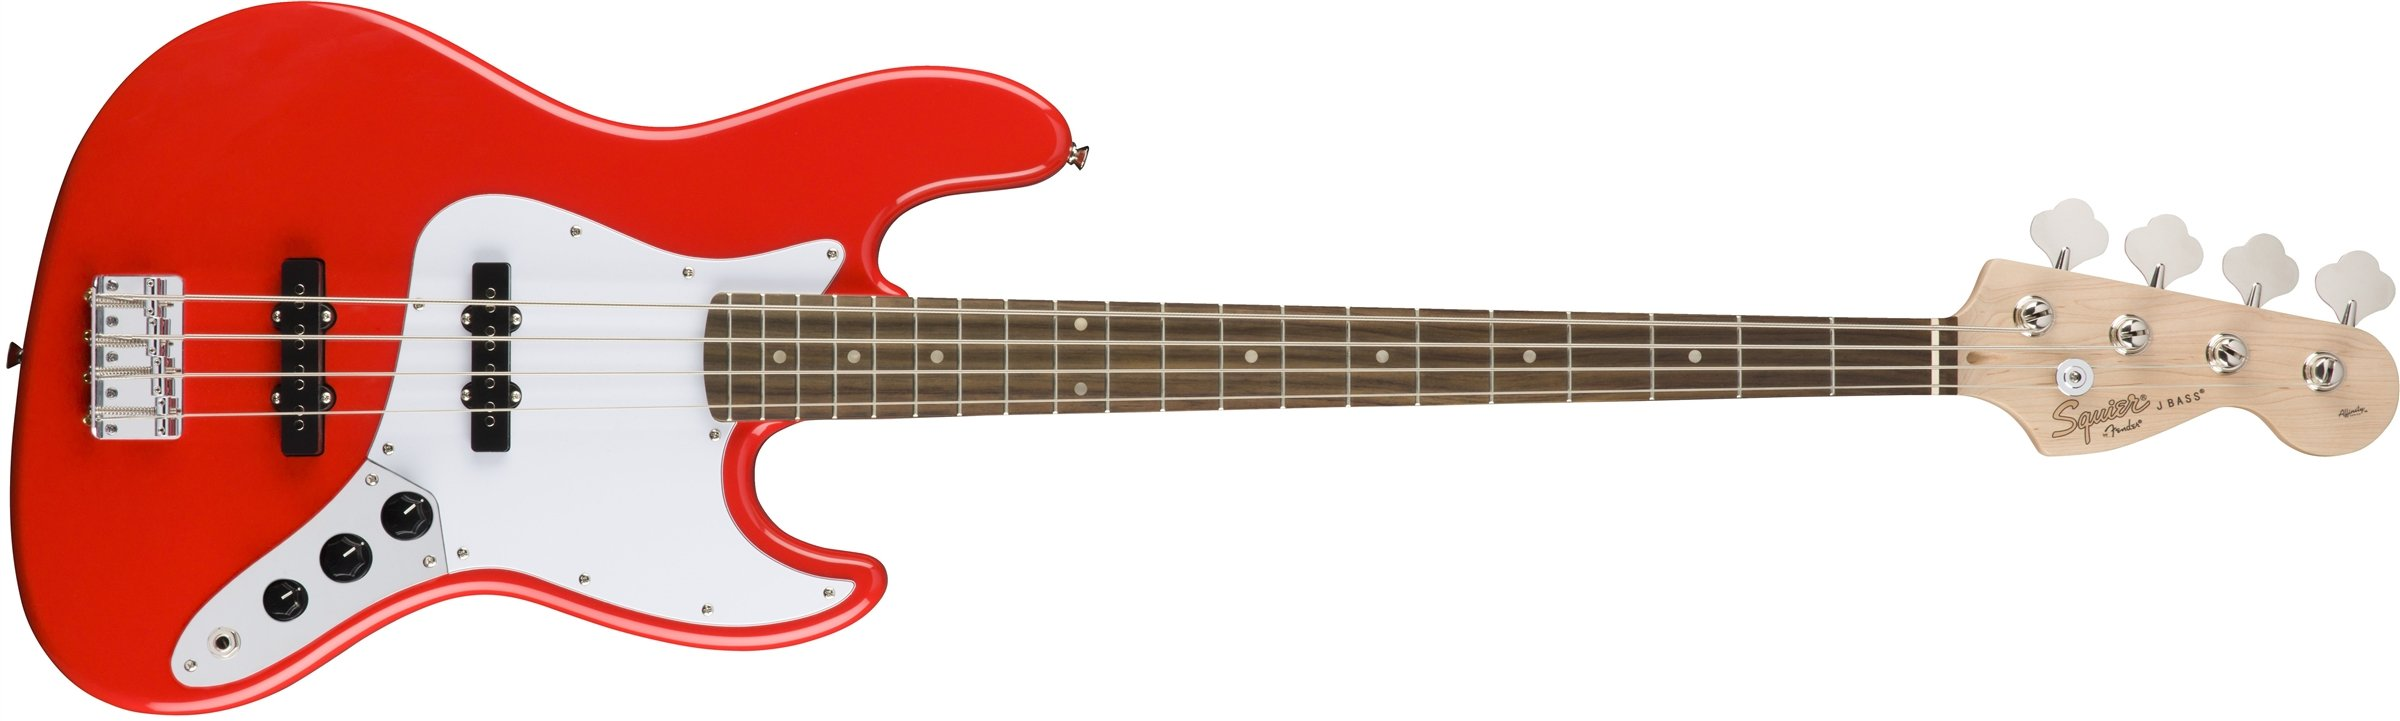 best rated in kids 39 guitars strings helpful customer reviews. Black Bedroom Furniture Sets. Home Design Ideas